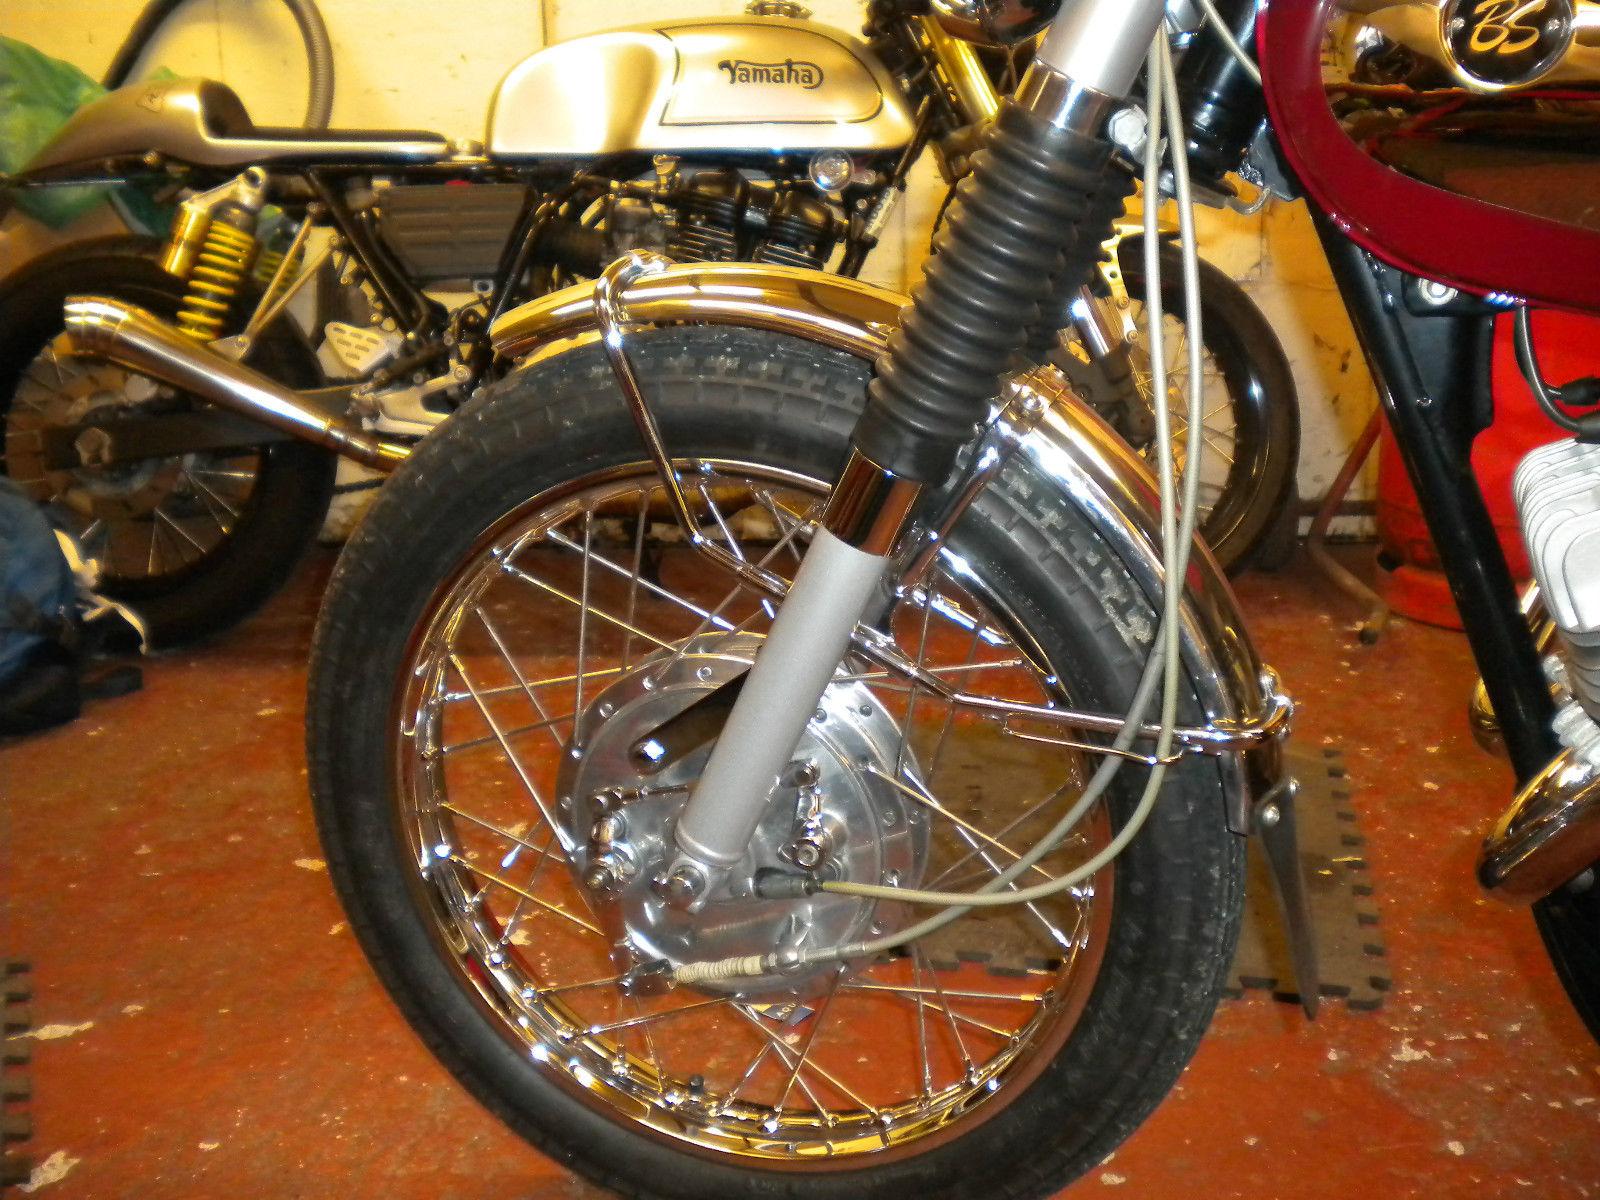 Bridgestone Mach11 -1969 - Front Wheel, Front Brake, Speedo Cable, Brake Cable and Spokes.